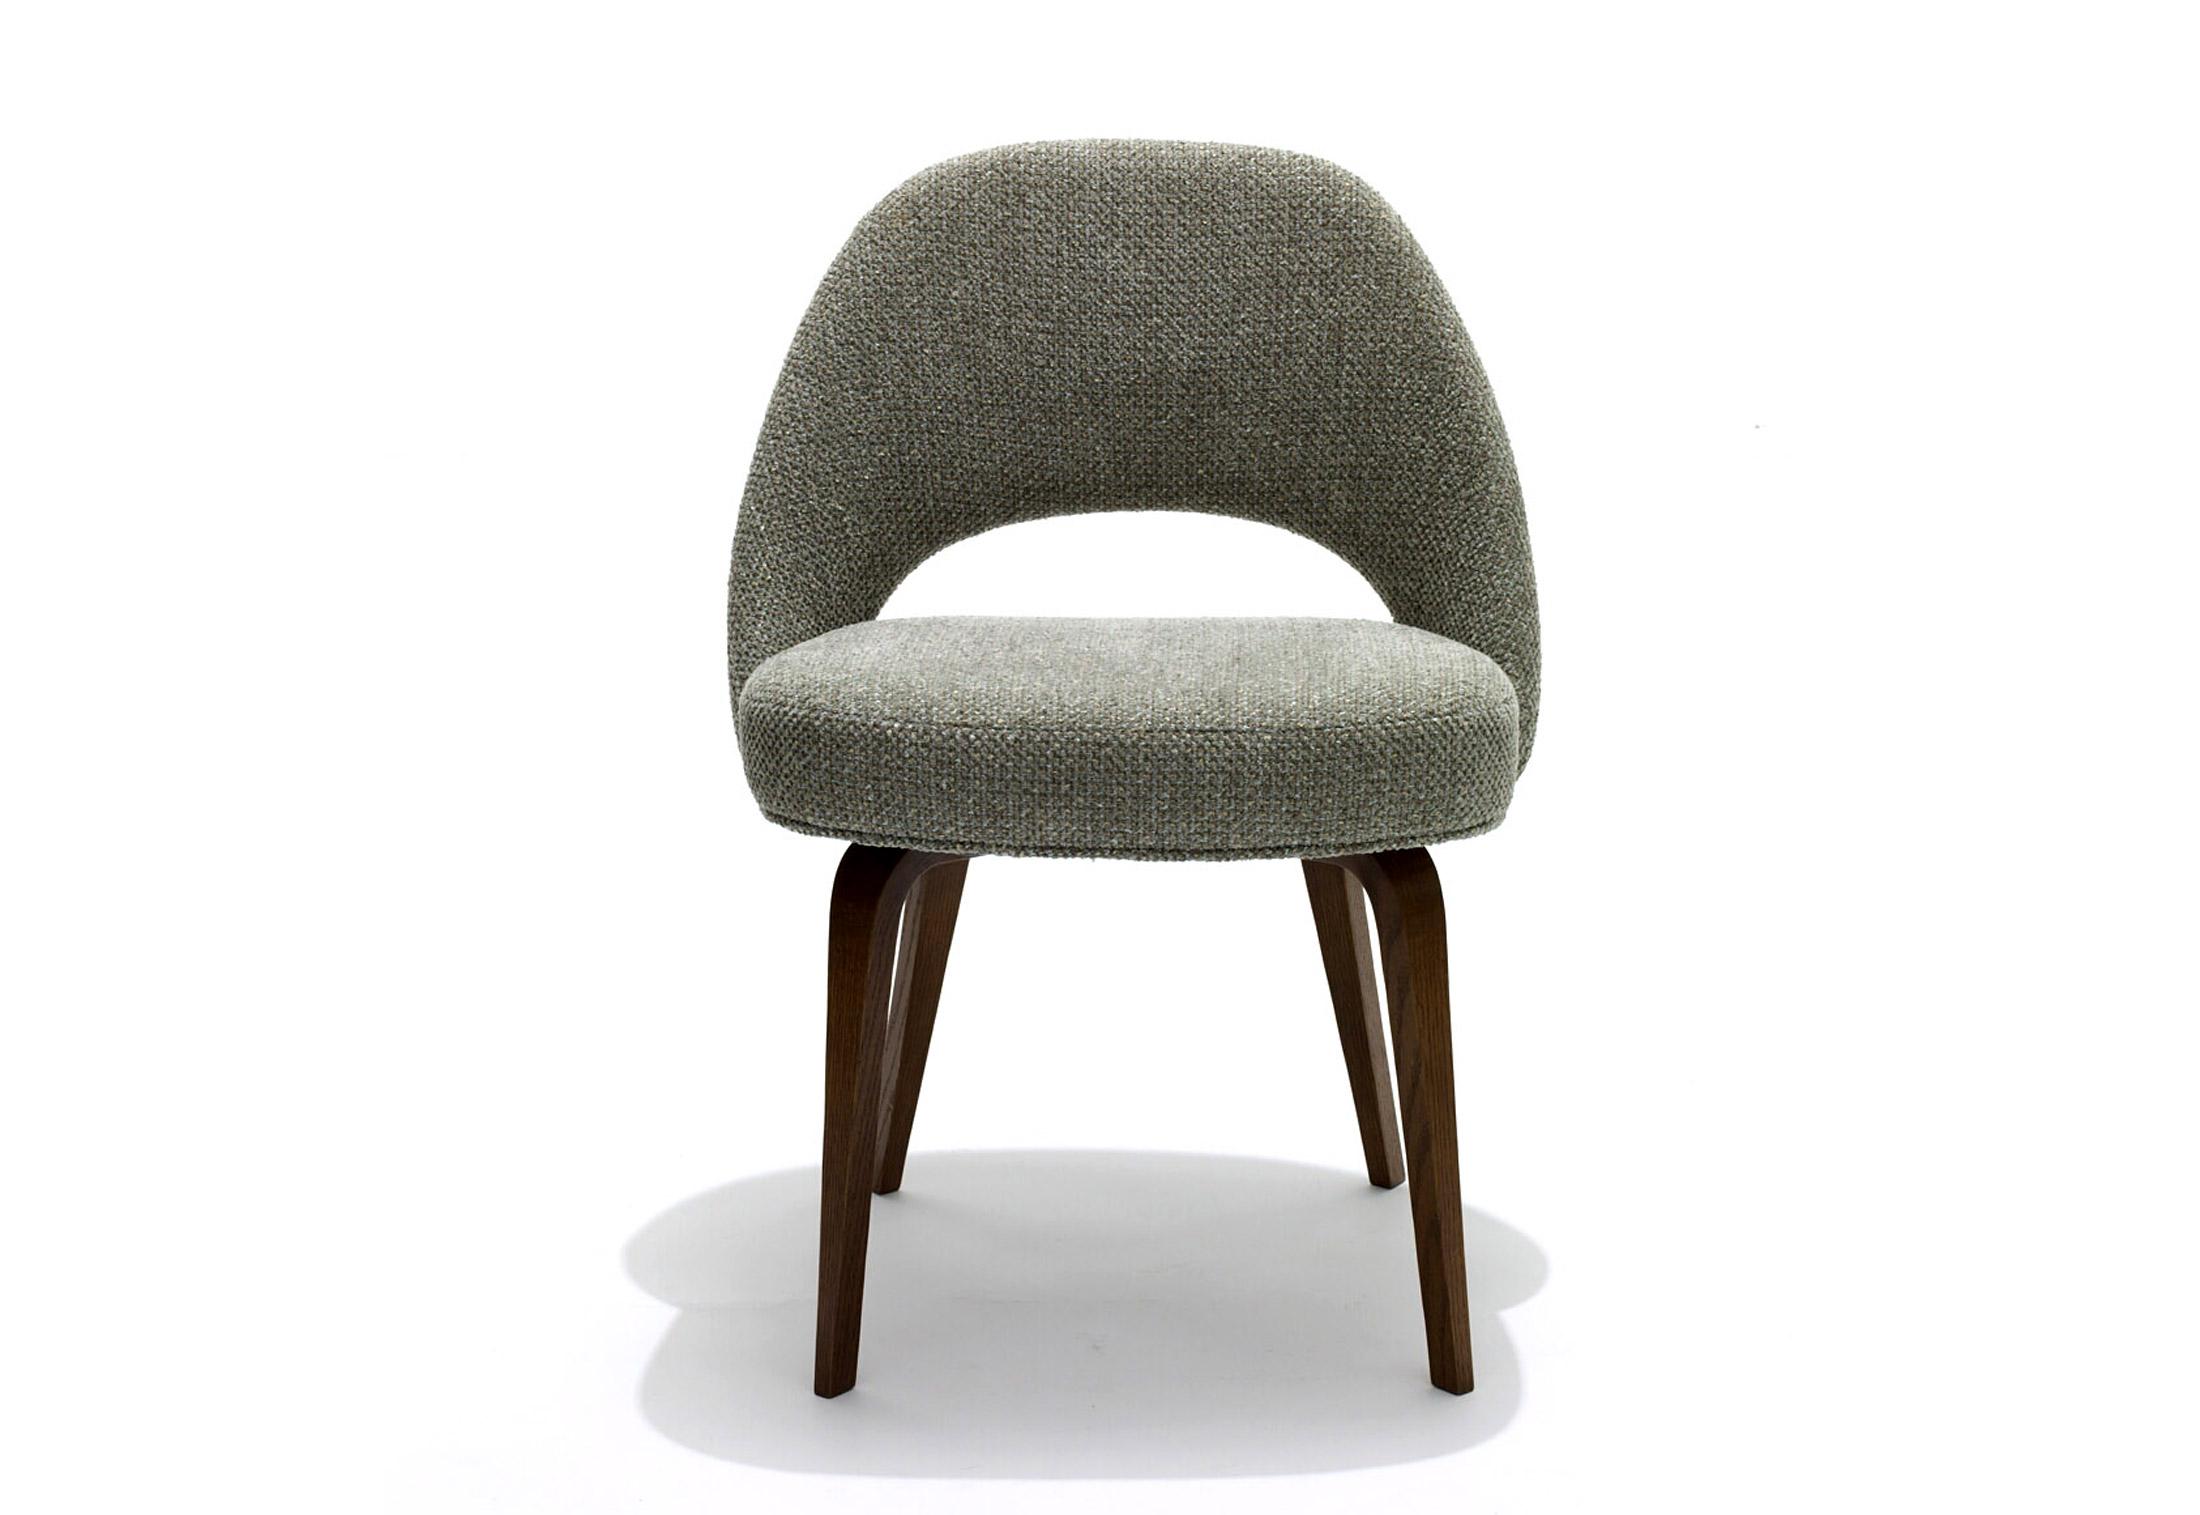 Saarinen executive conference chair 2 by knoll stylepark - Tavolo saarinen knoll originale ...